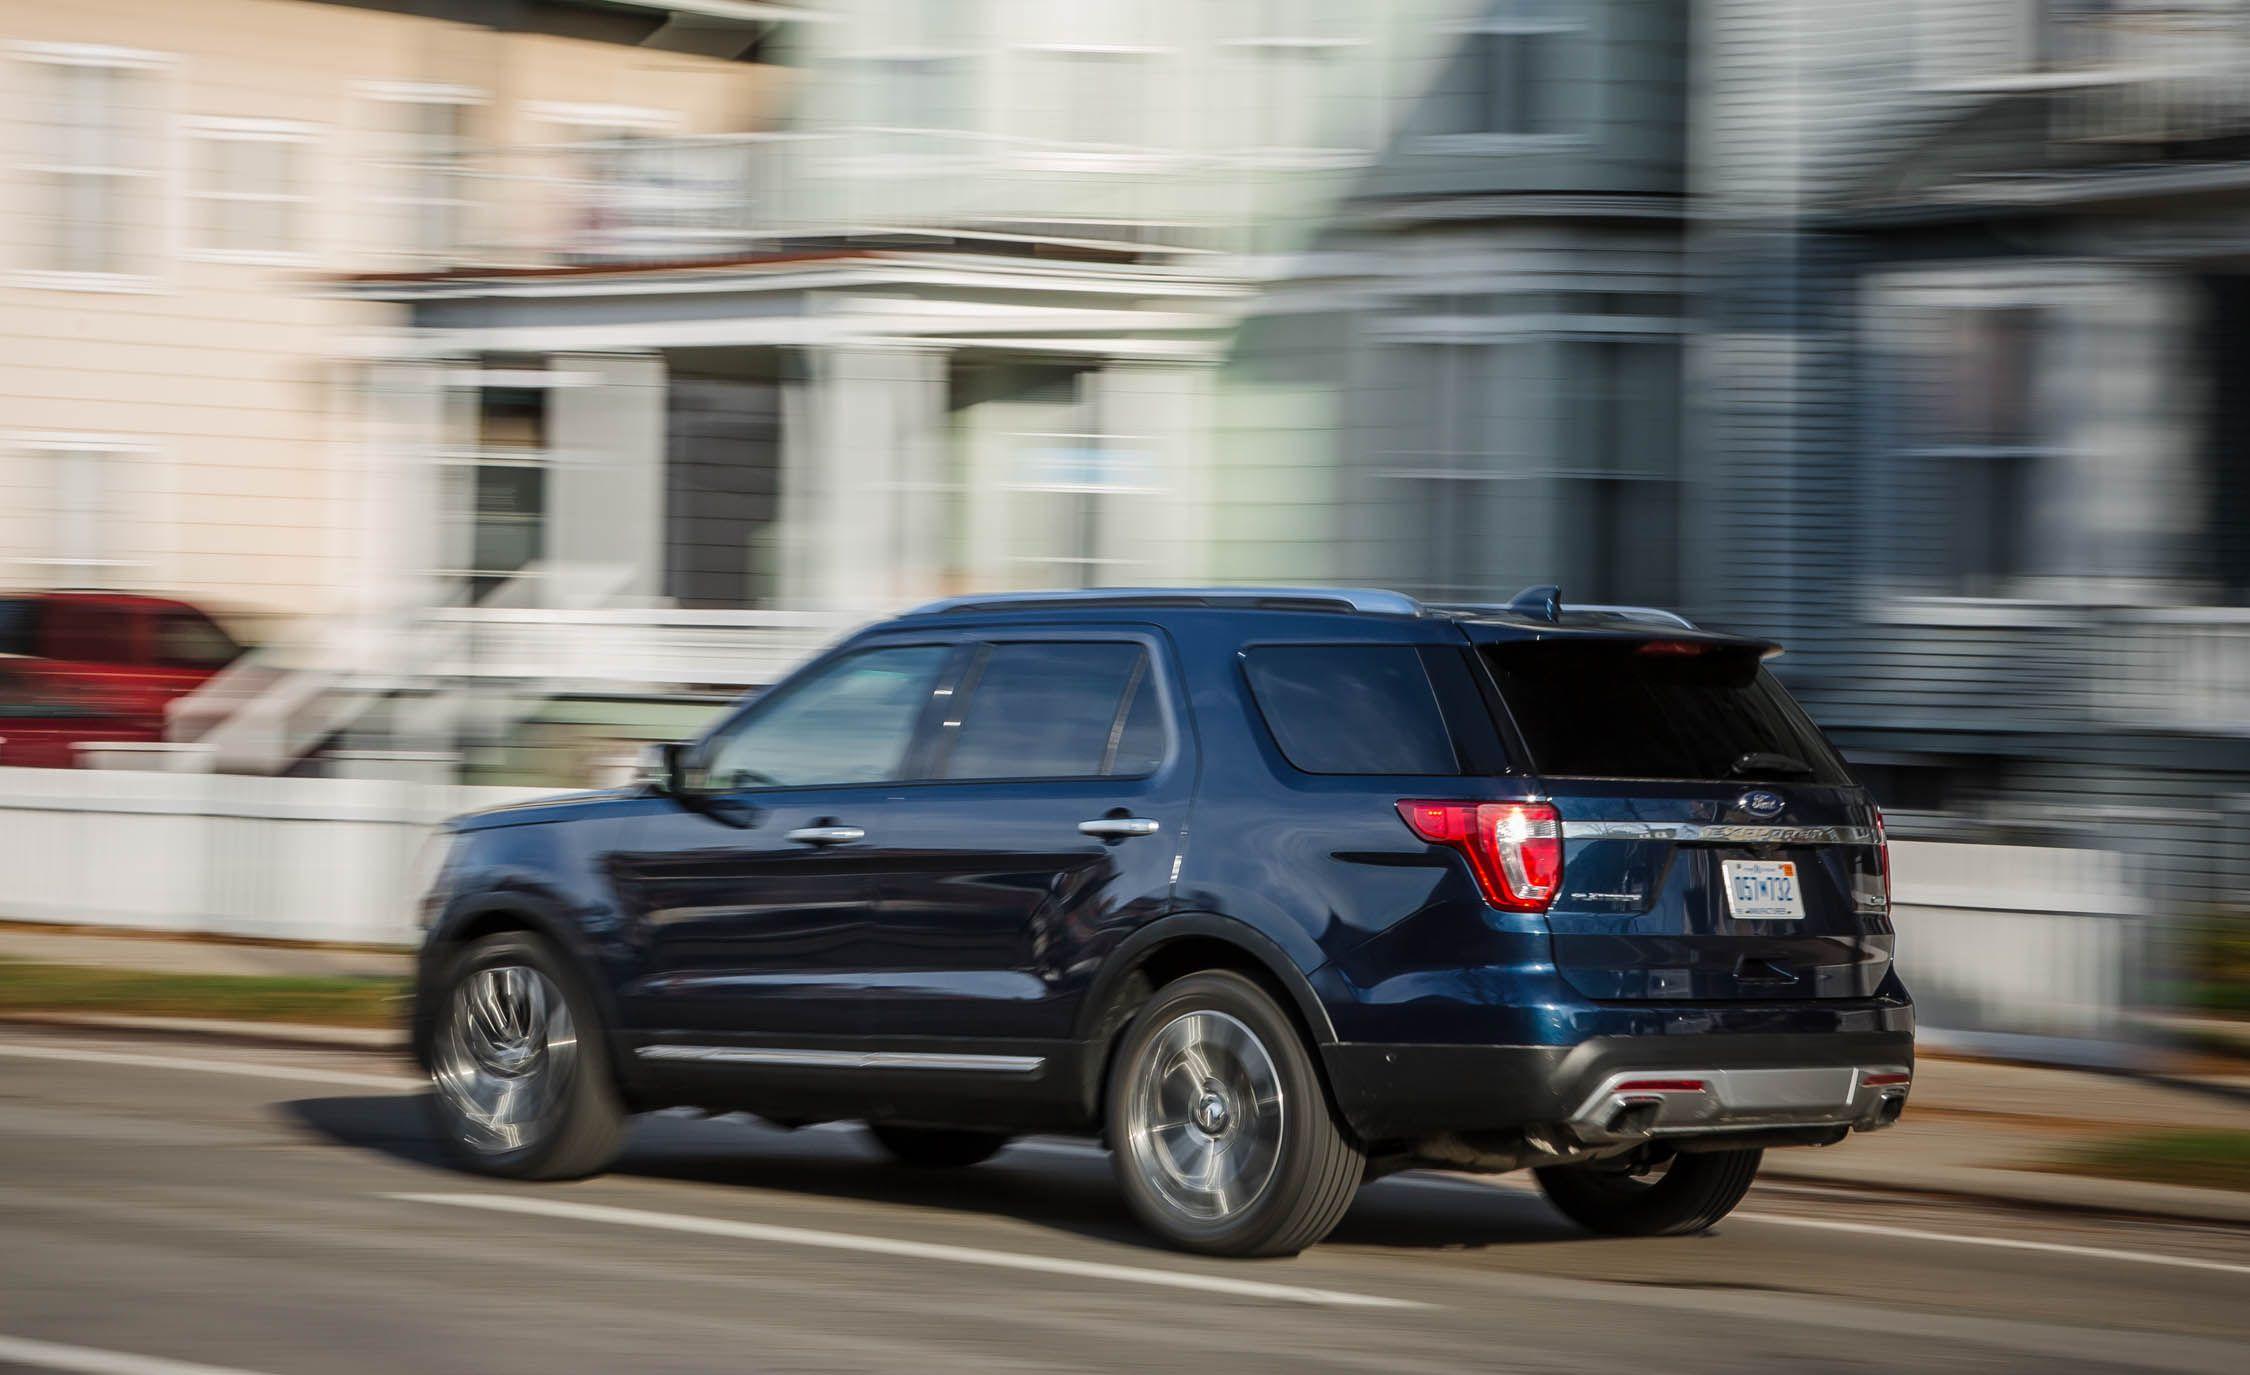 Ford explorer reviews ford explorer price photos and specs car and driver